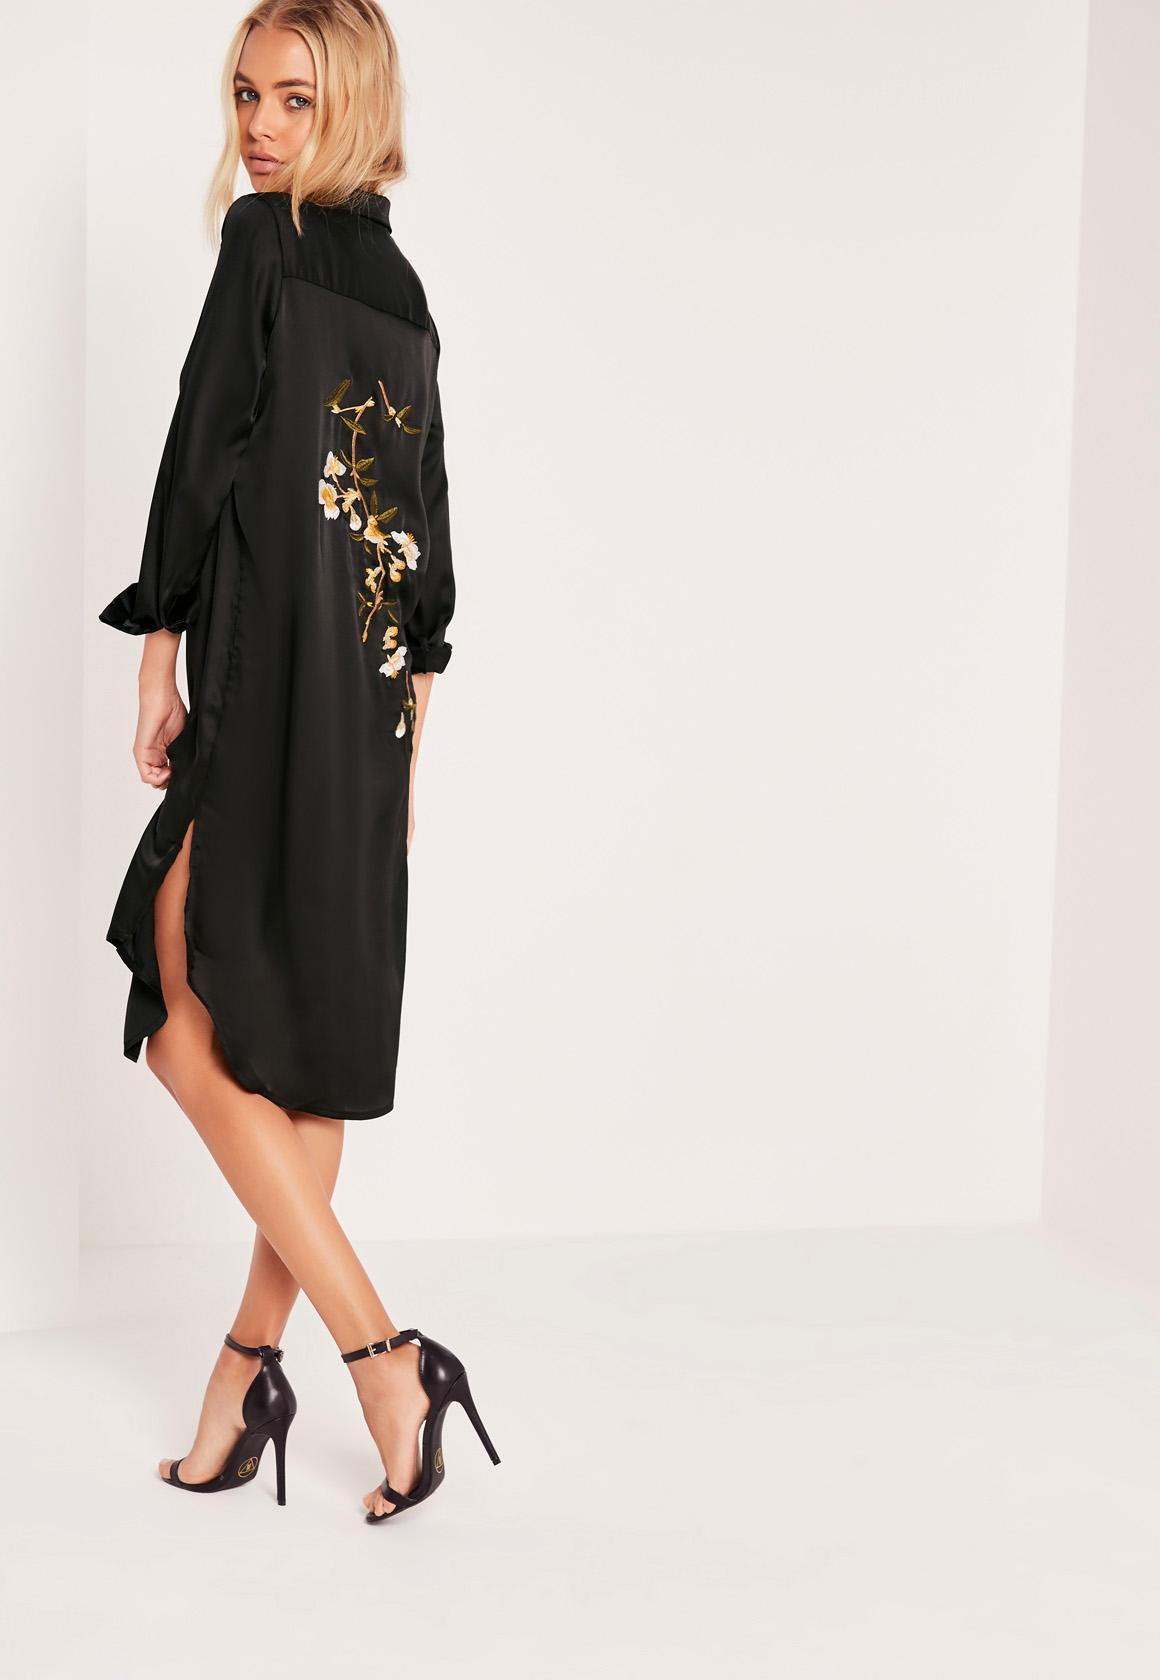 Black shirt dress - Embroidery Back Shirt Dress Black Previous Next